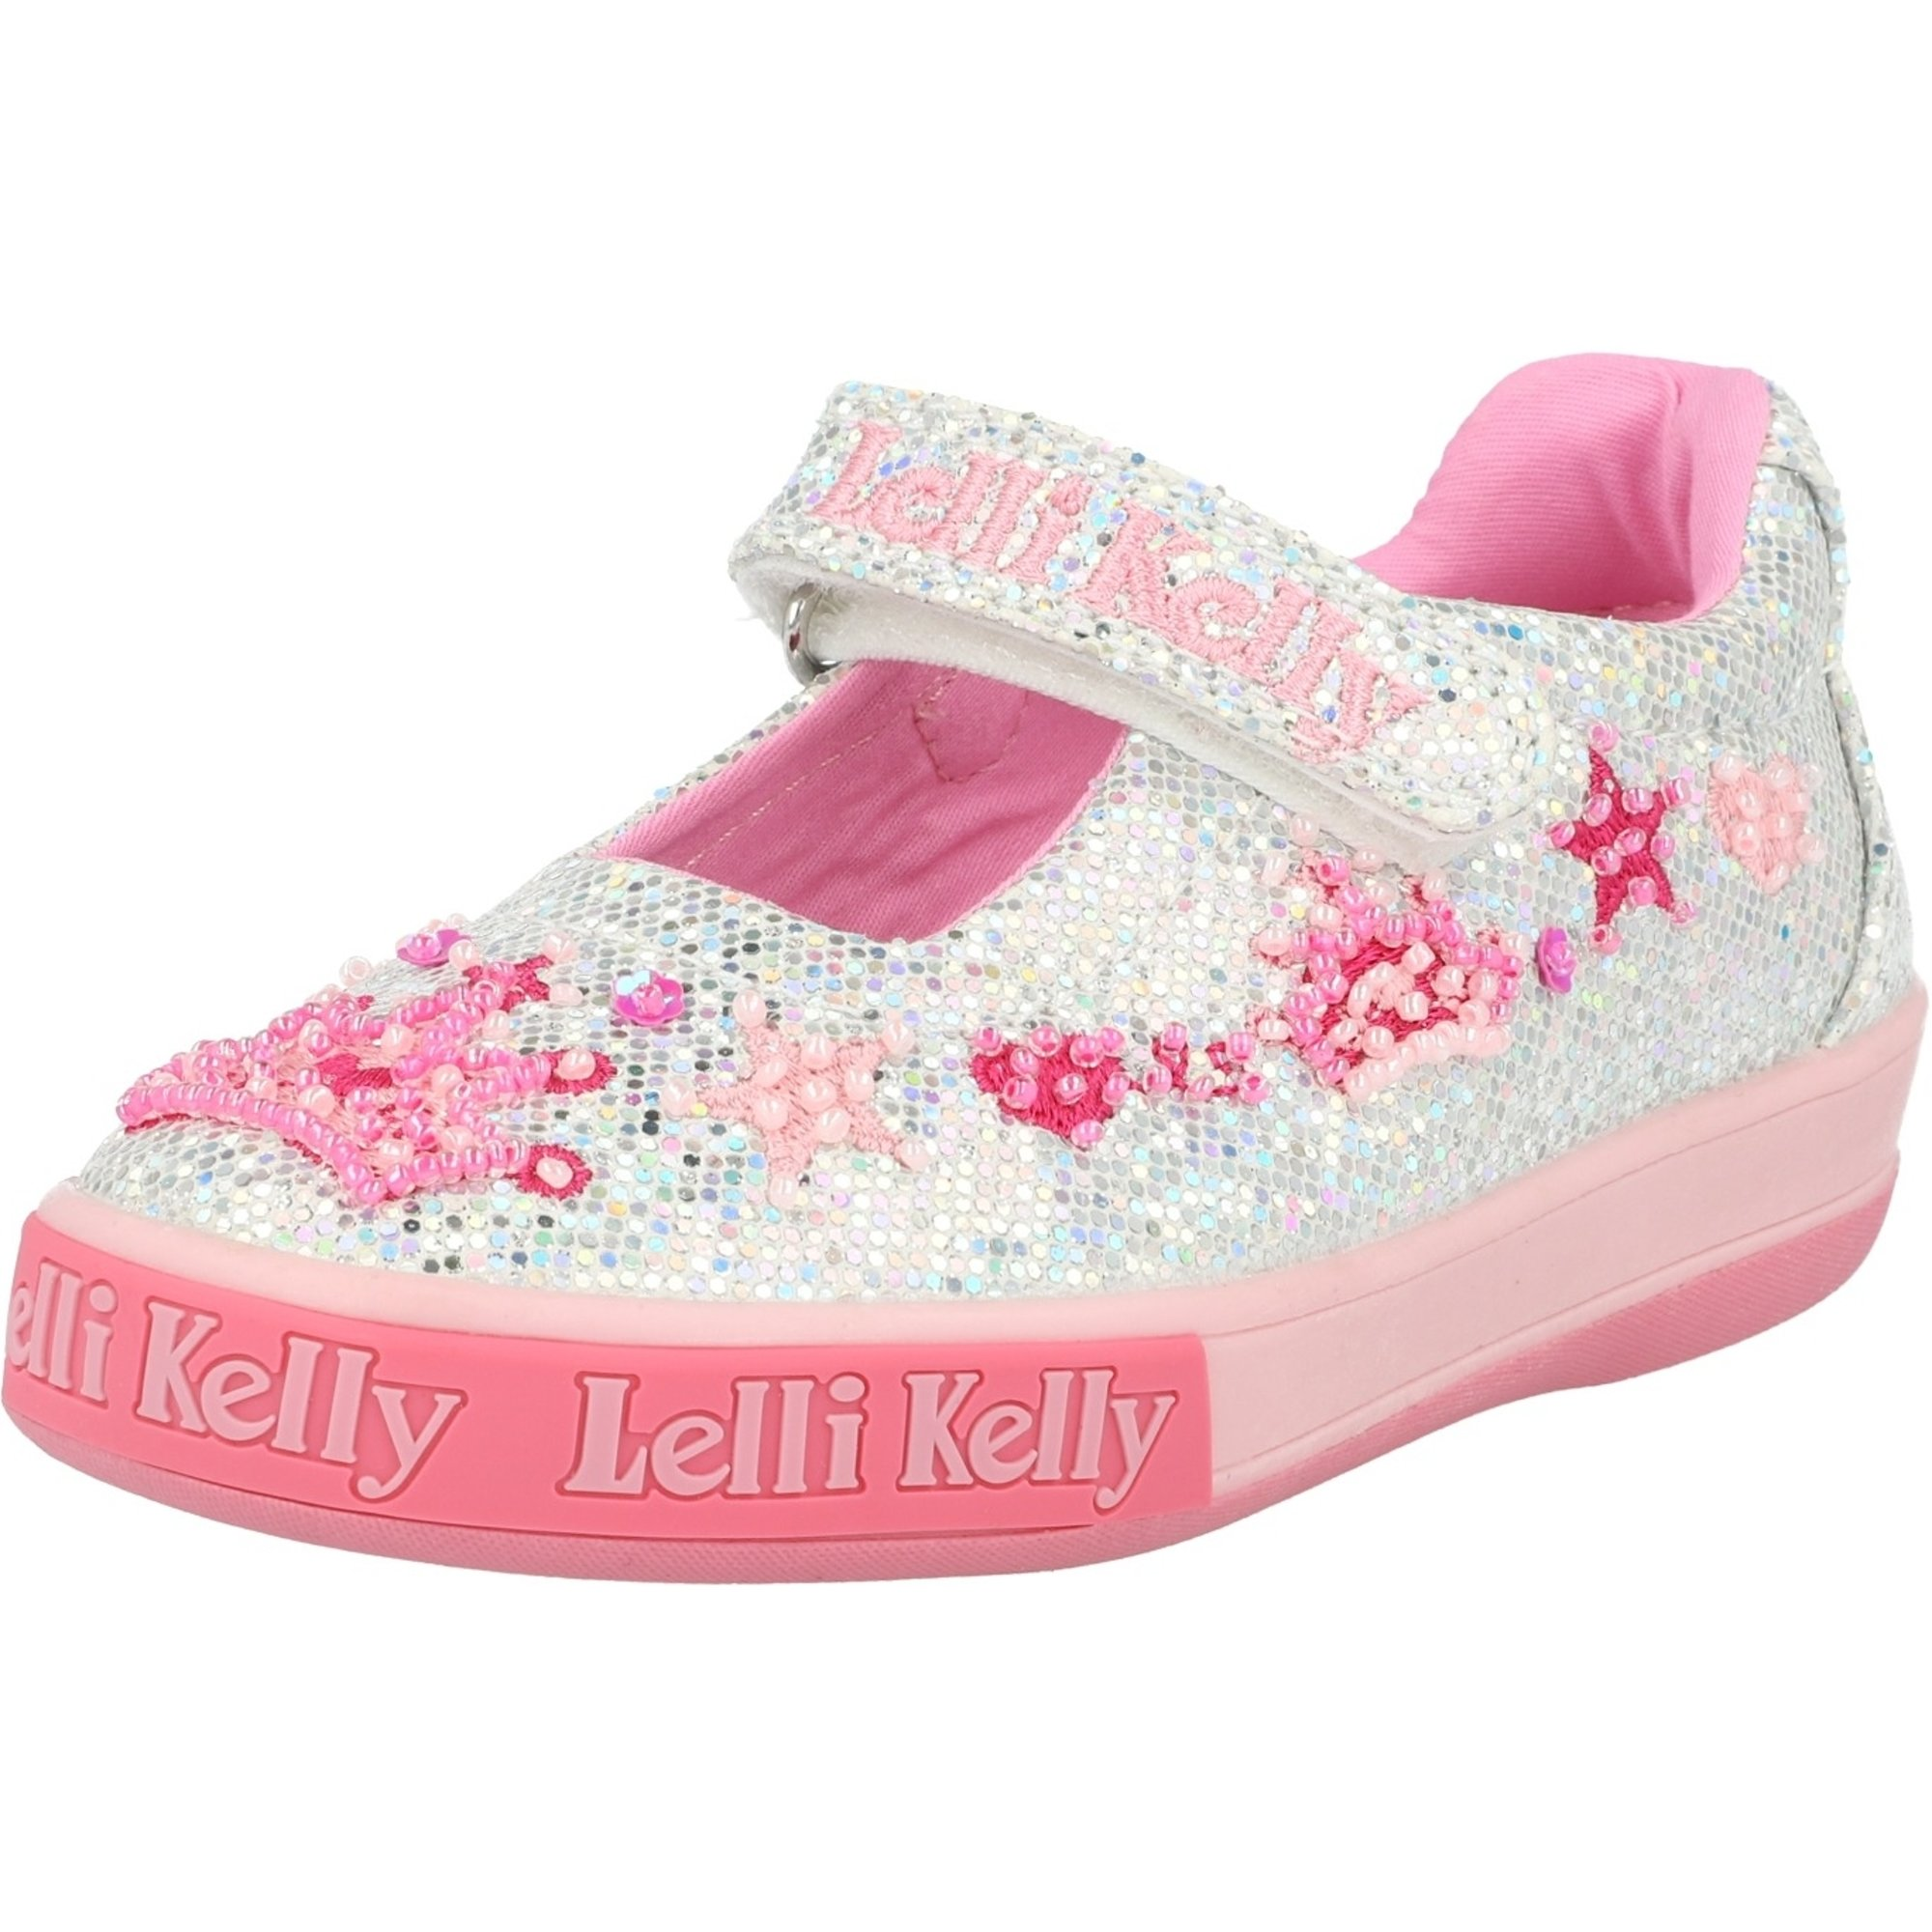 Lelli Kelly Tiara Dolly Silver Glitter